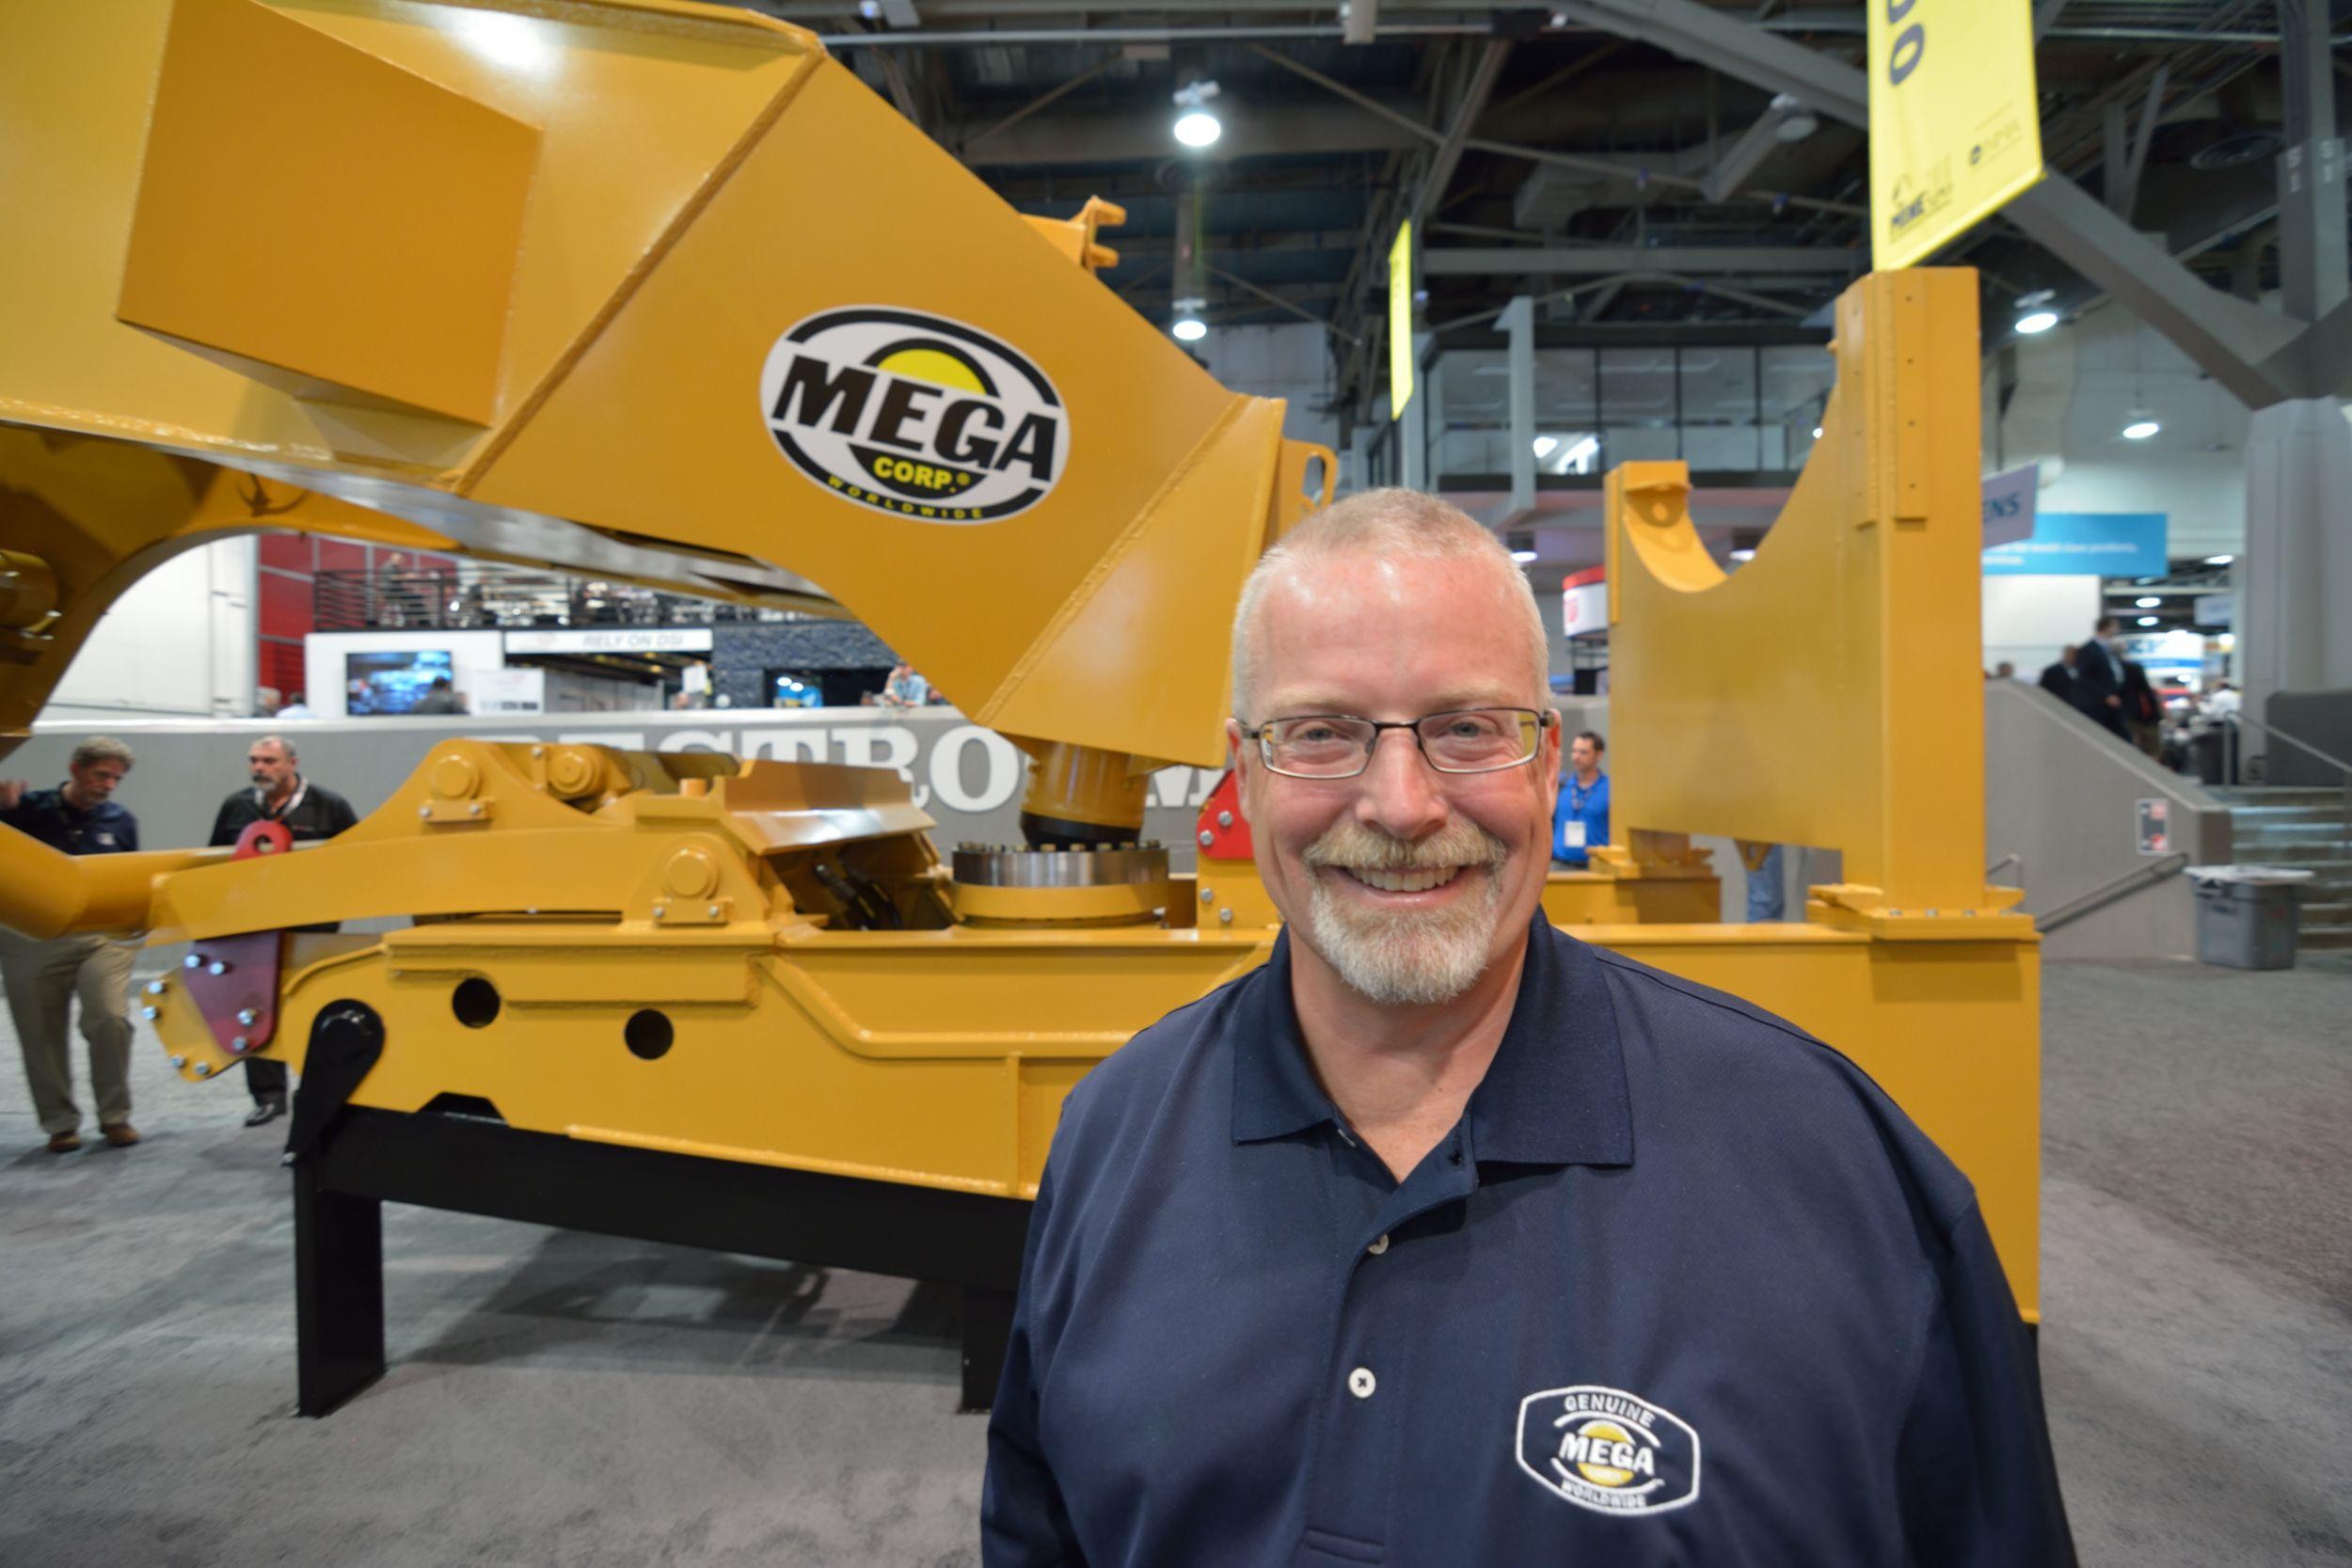 Jim Kunz, President of Mega Corp.